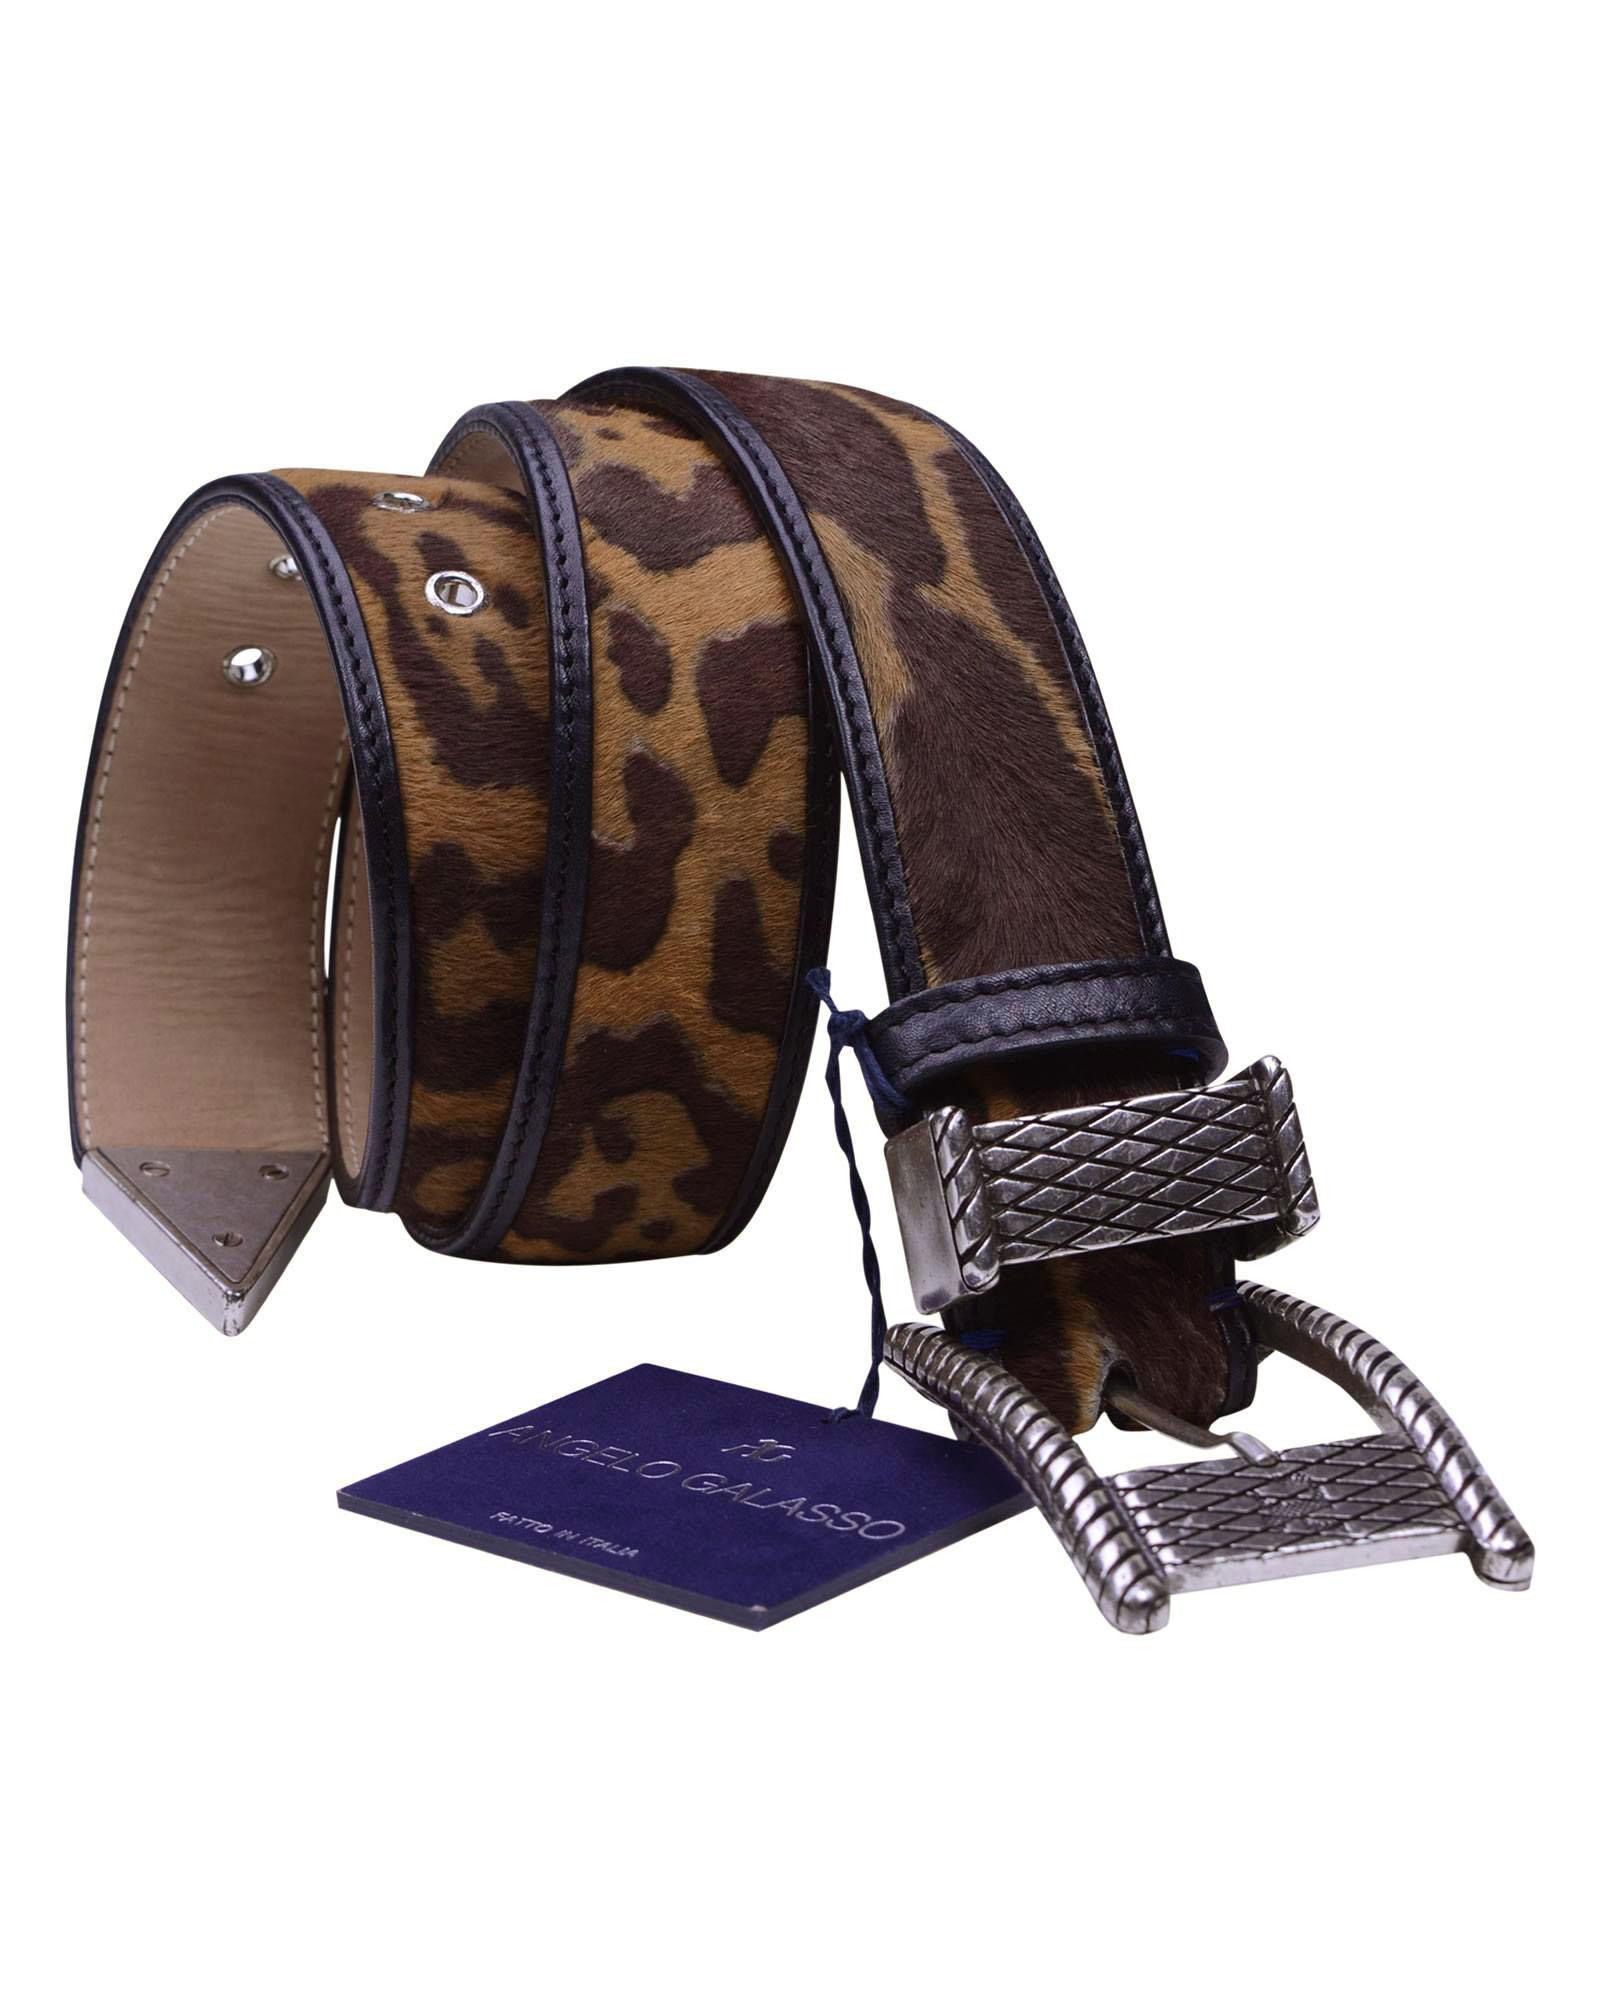 Angelo Galasso Signature Pony skin Palladium - plated Exclusive Belt